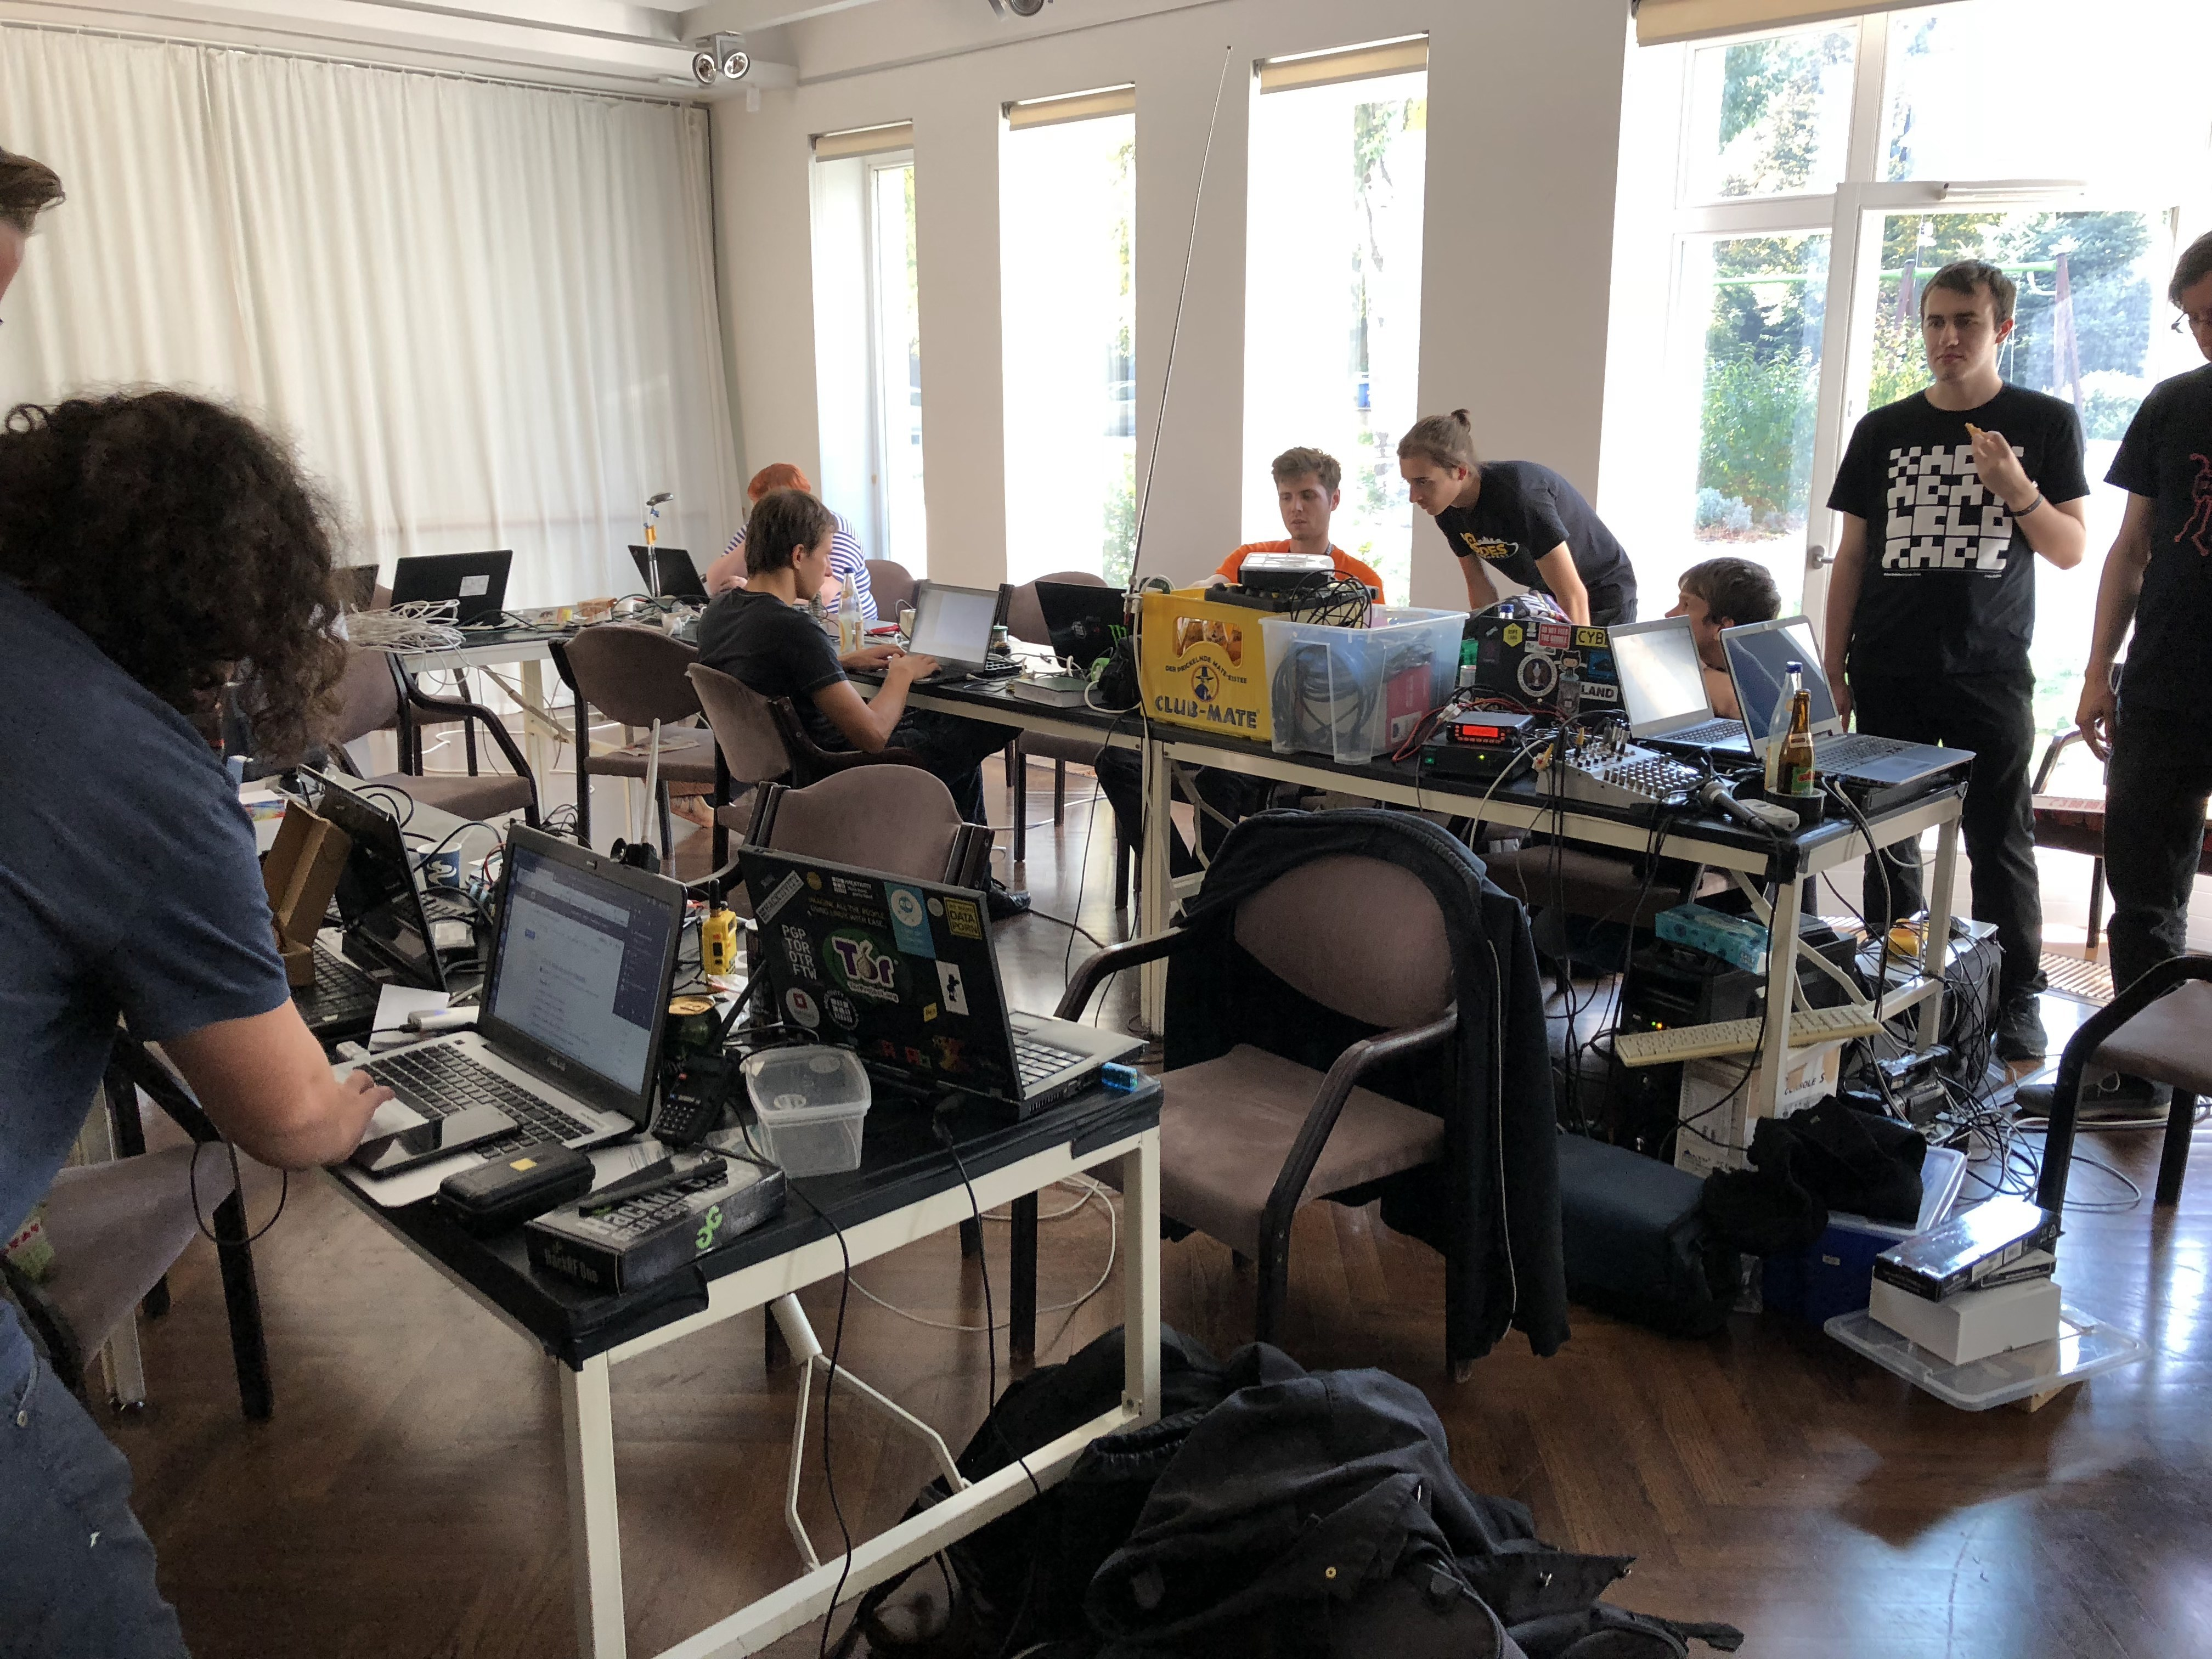 REPTILEHAUS at Hacktivity Budapest '18